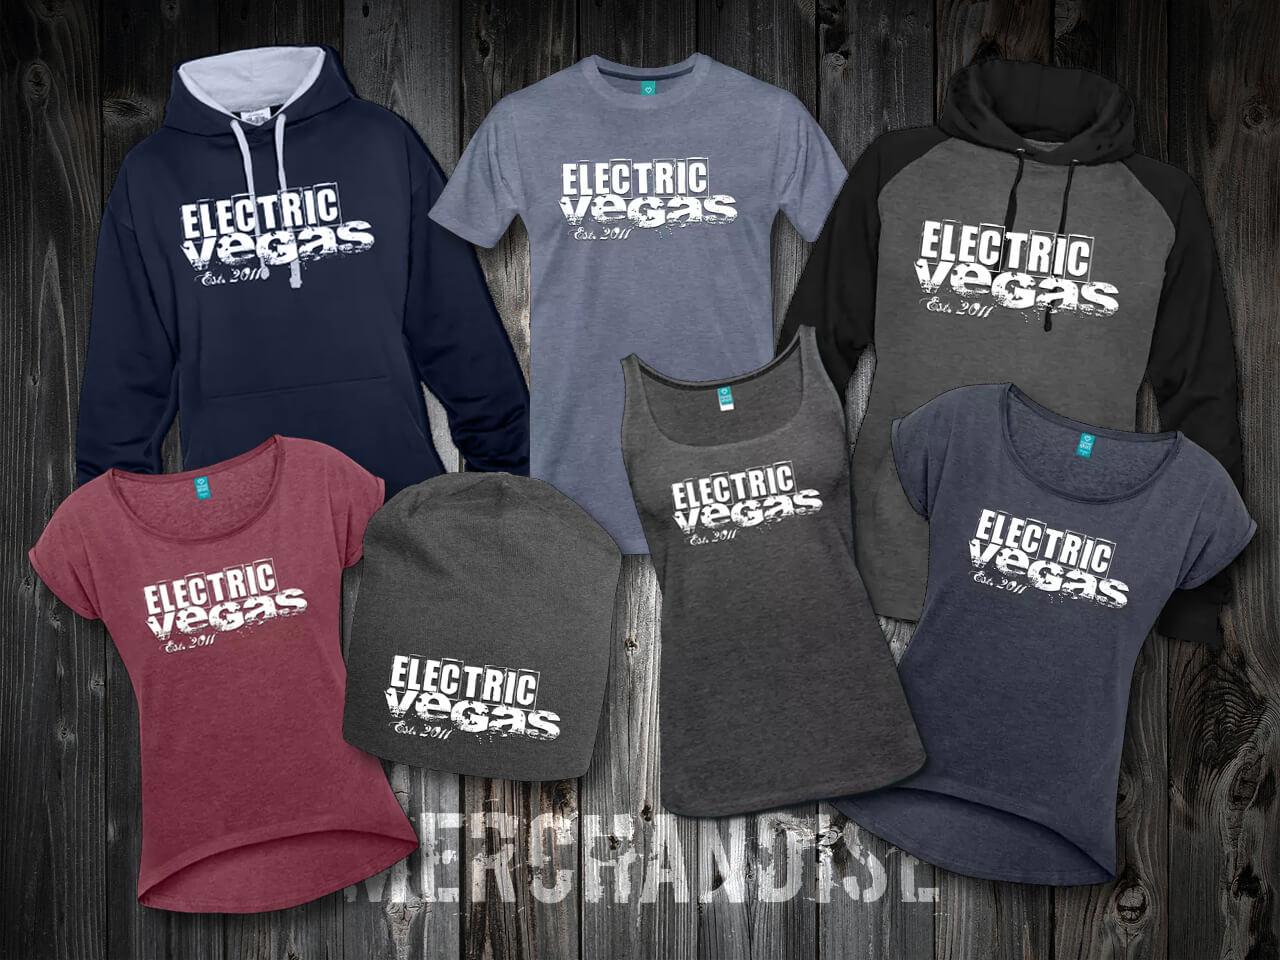 Electric Vegas Merchandise 2018